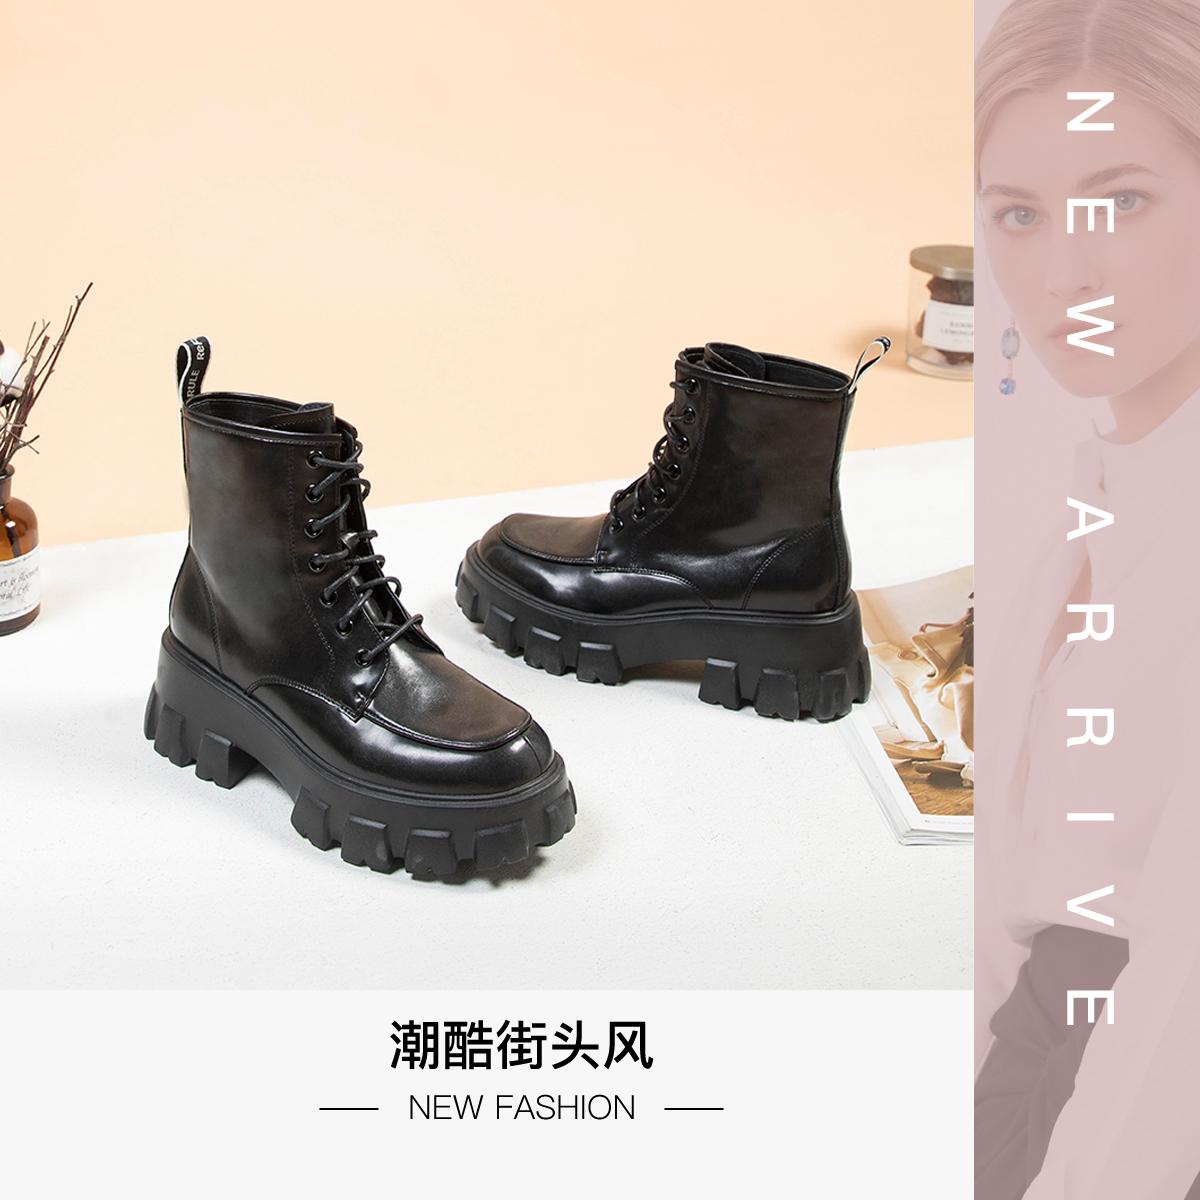 SS03116033 秋冬新款厚底潮流前系带时装靴黑色女靴 2020 星期六女鞋